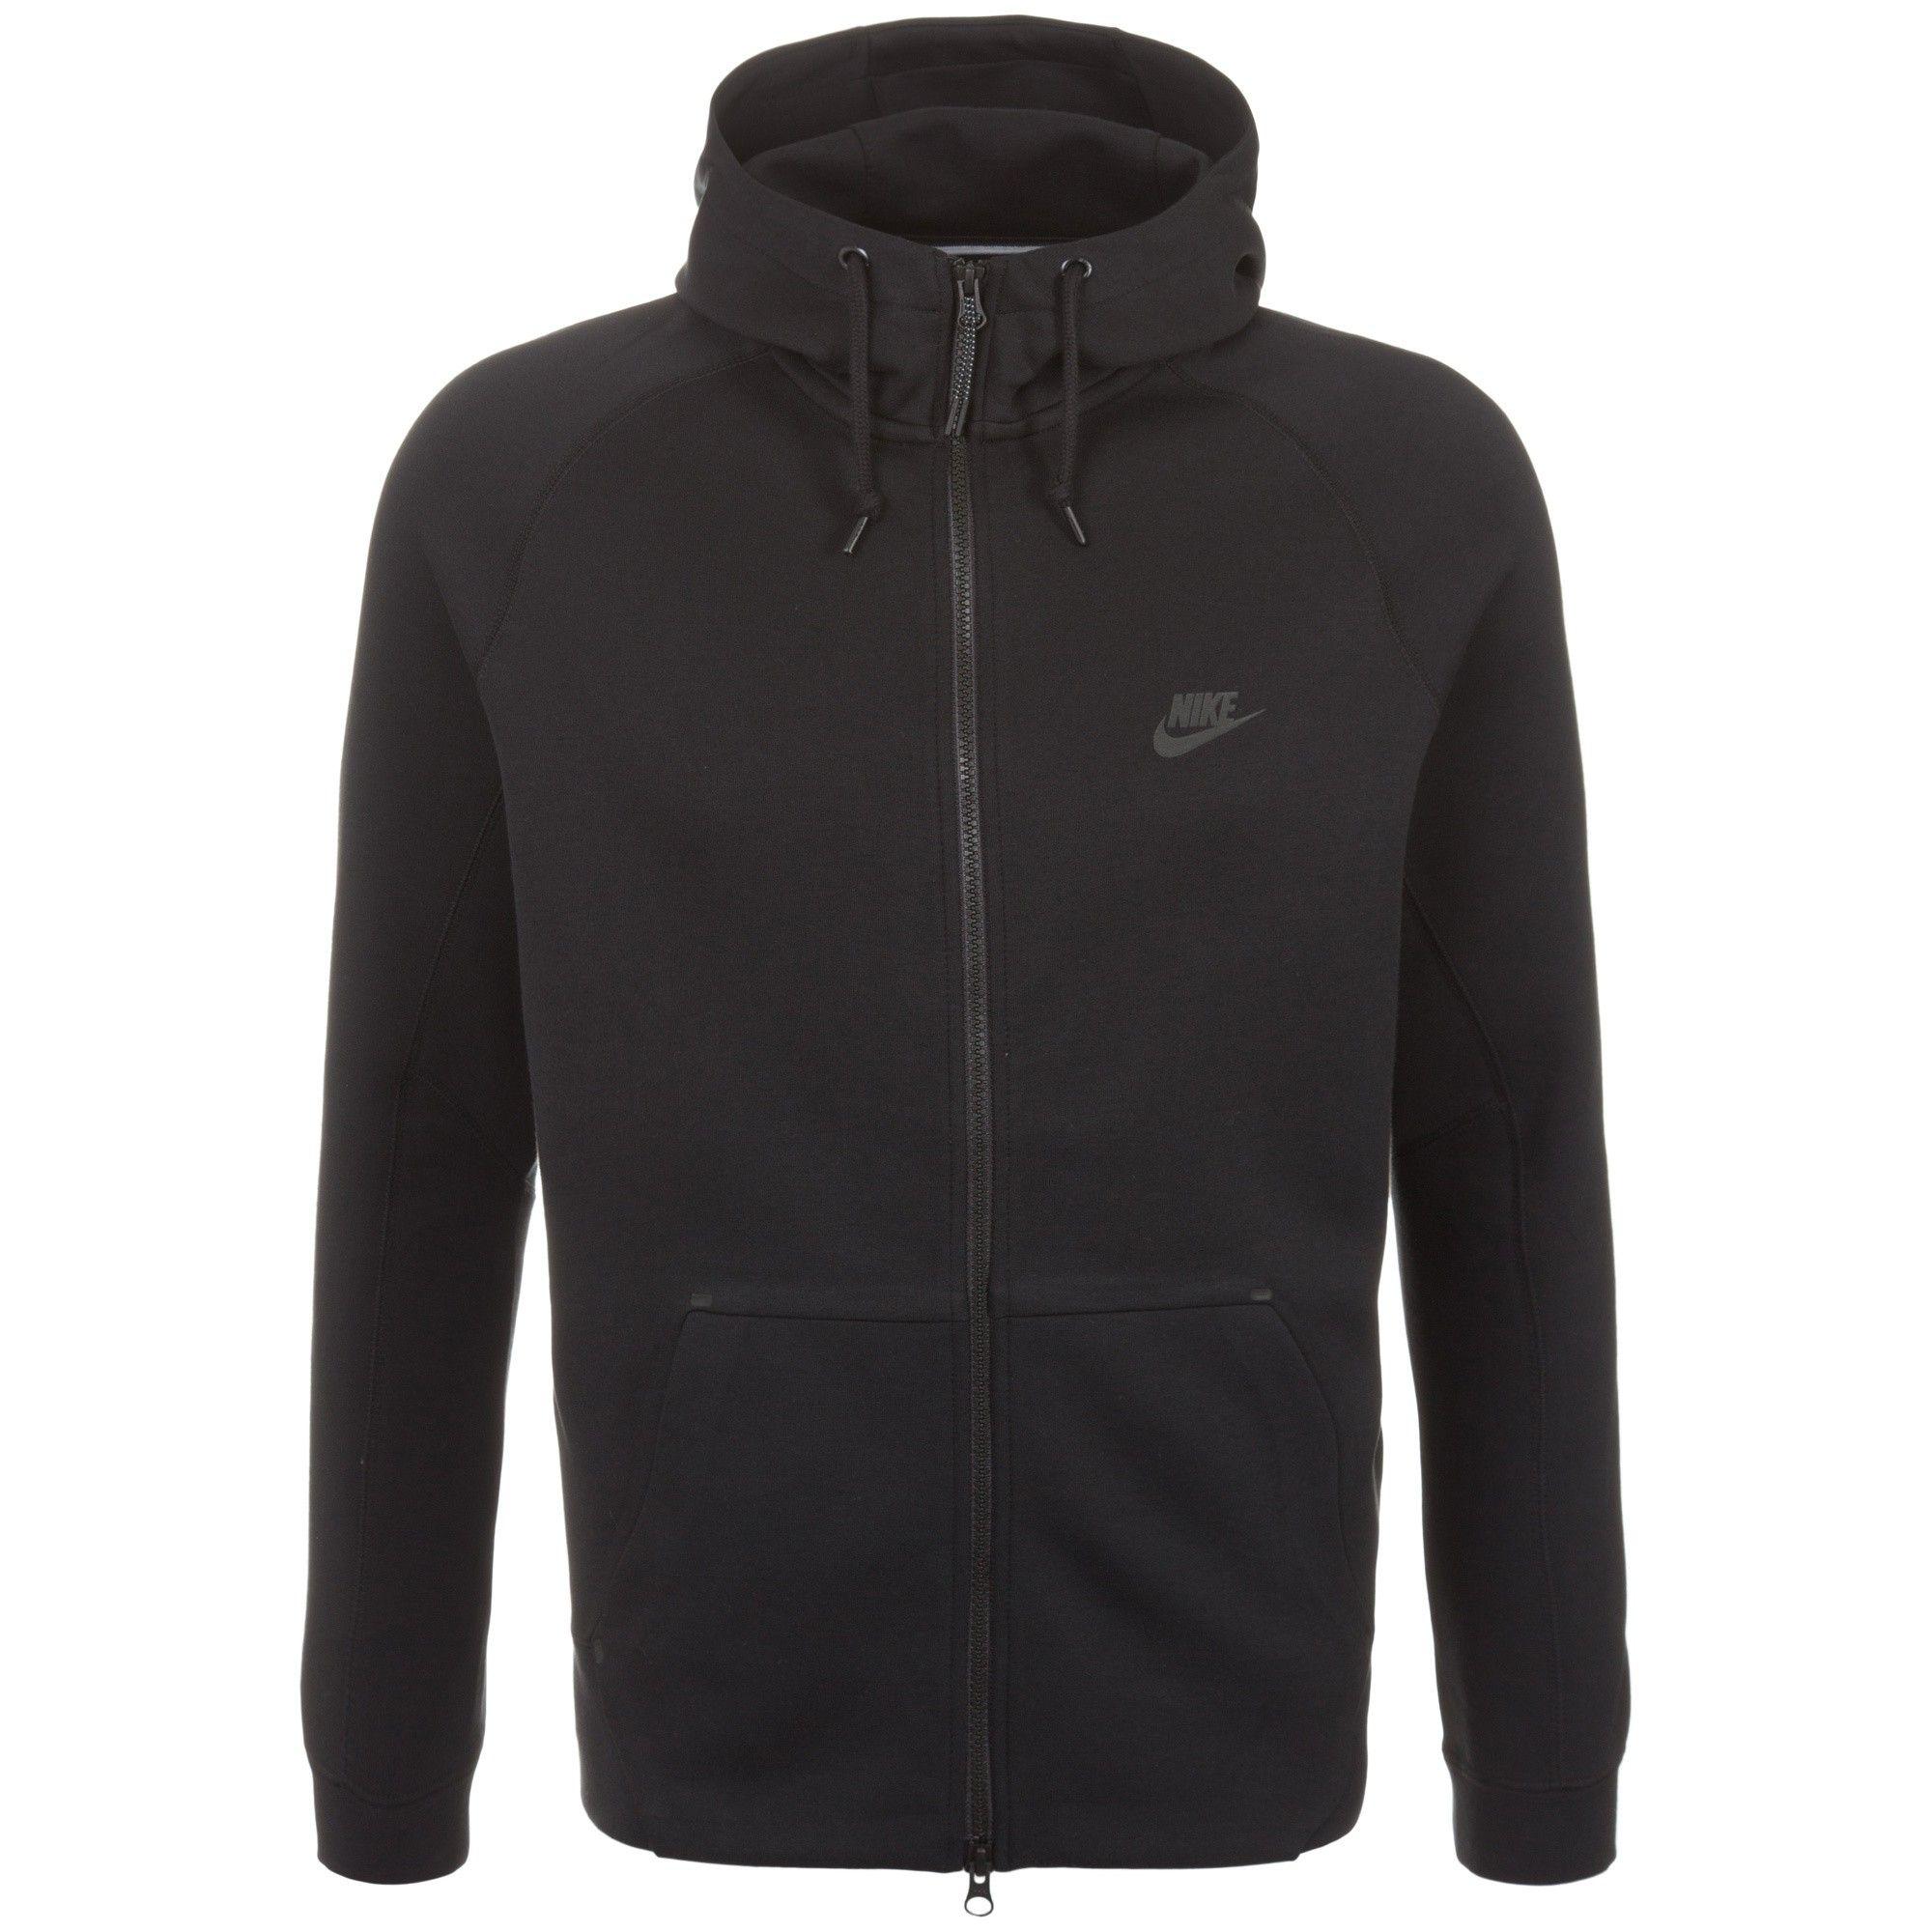 top brands no sale tax cheapest price Sweat Nike Tech Fleece AW77 Full Zip Hoodie - 559592-012